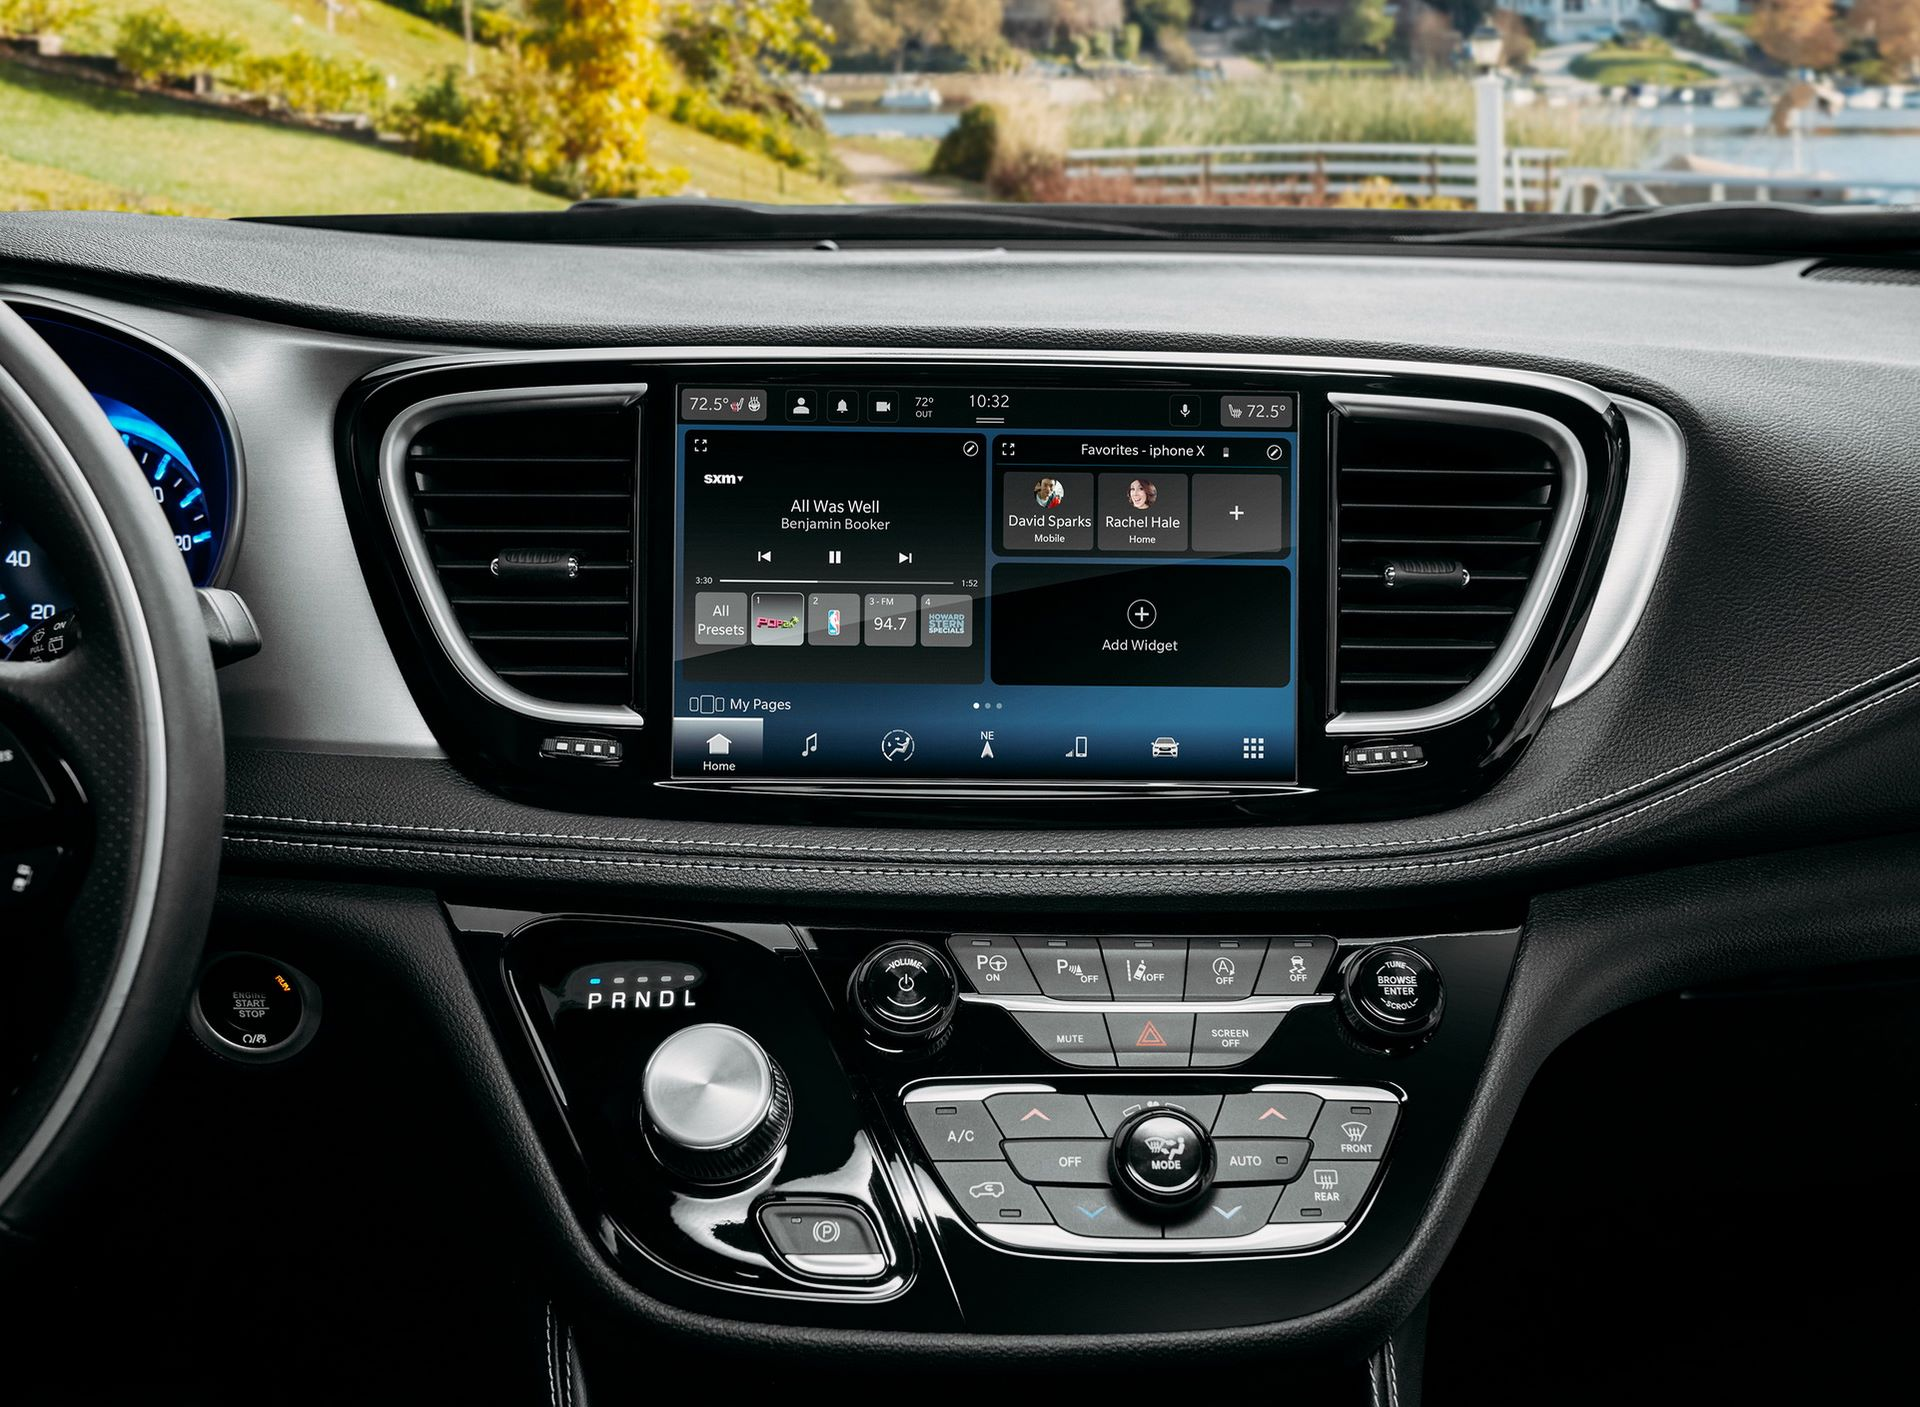 2021-Chrysler-Pacifica-41